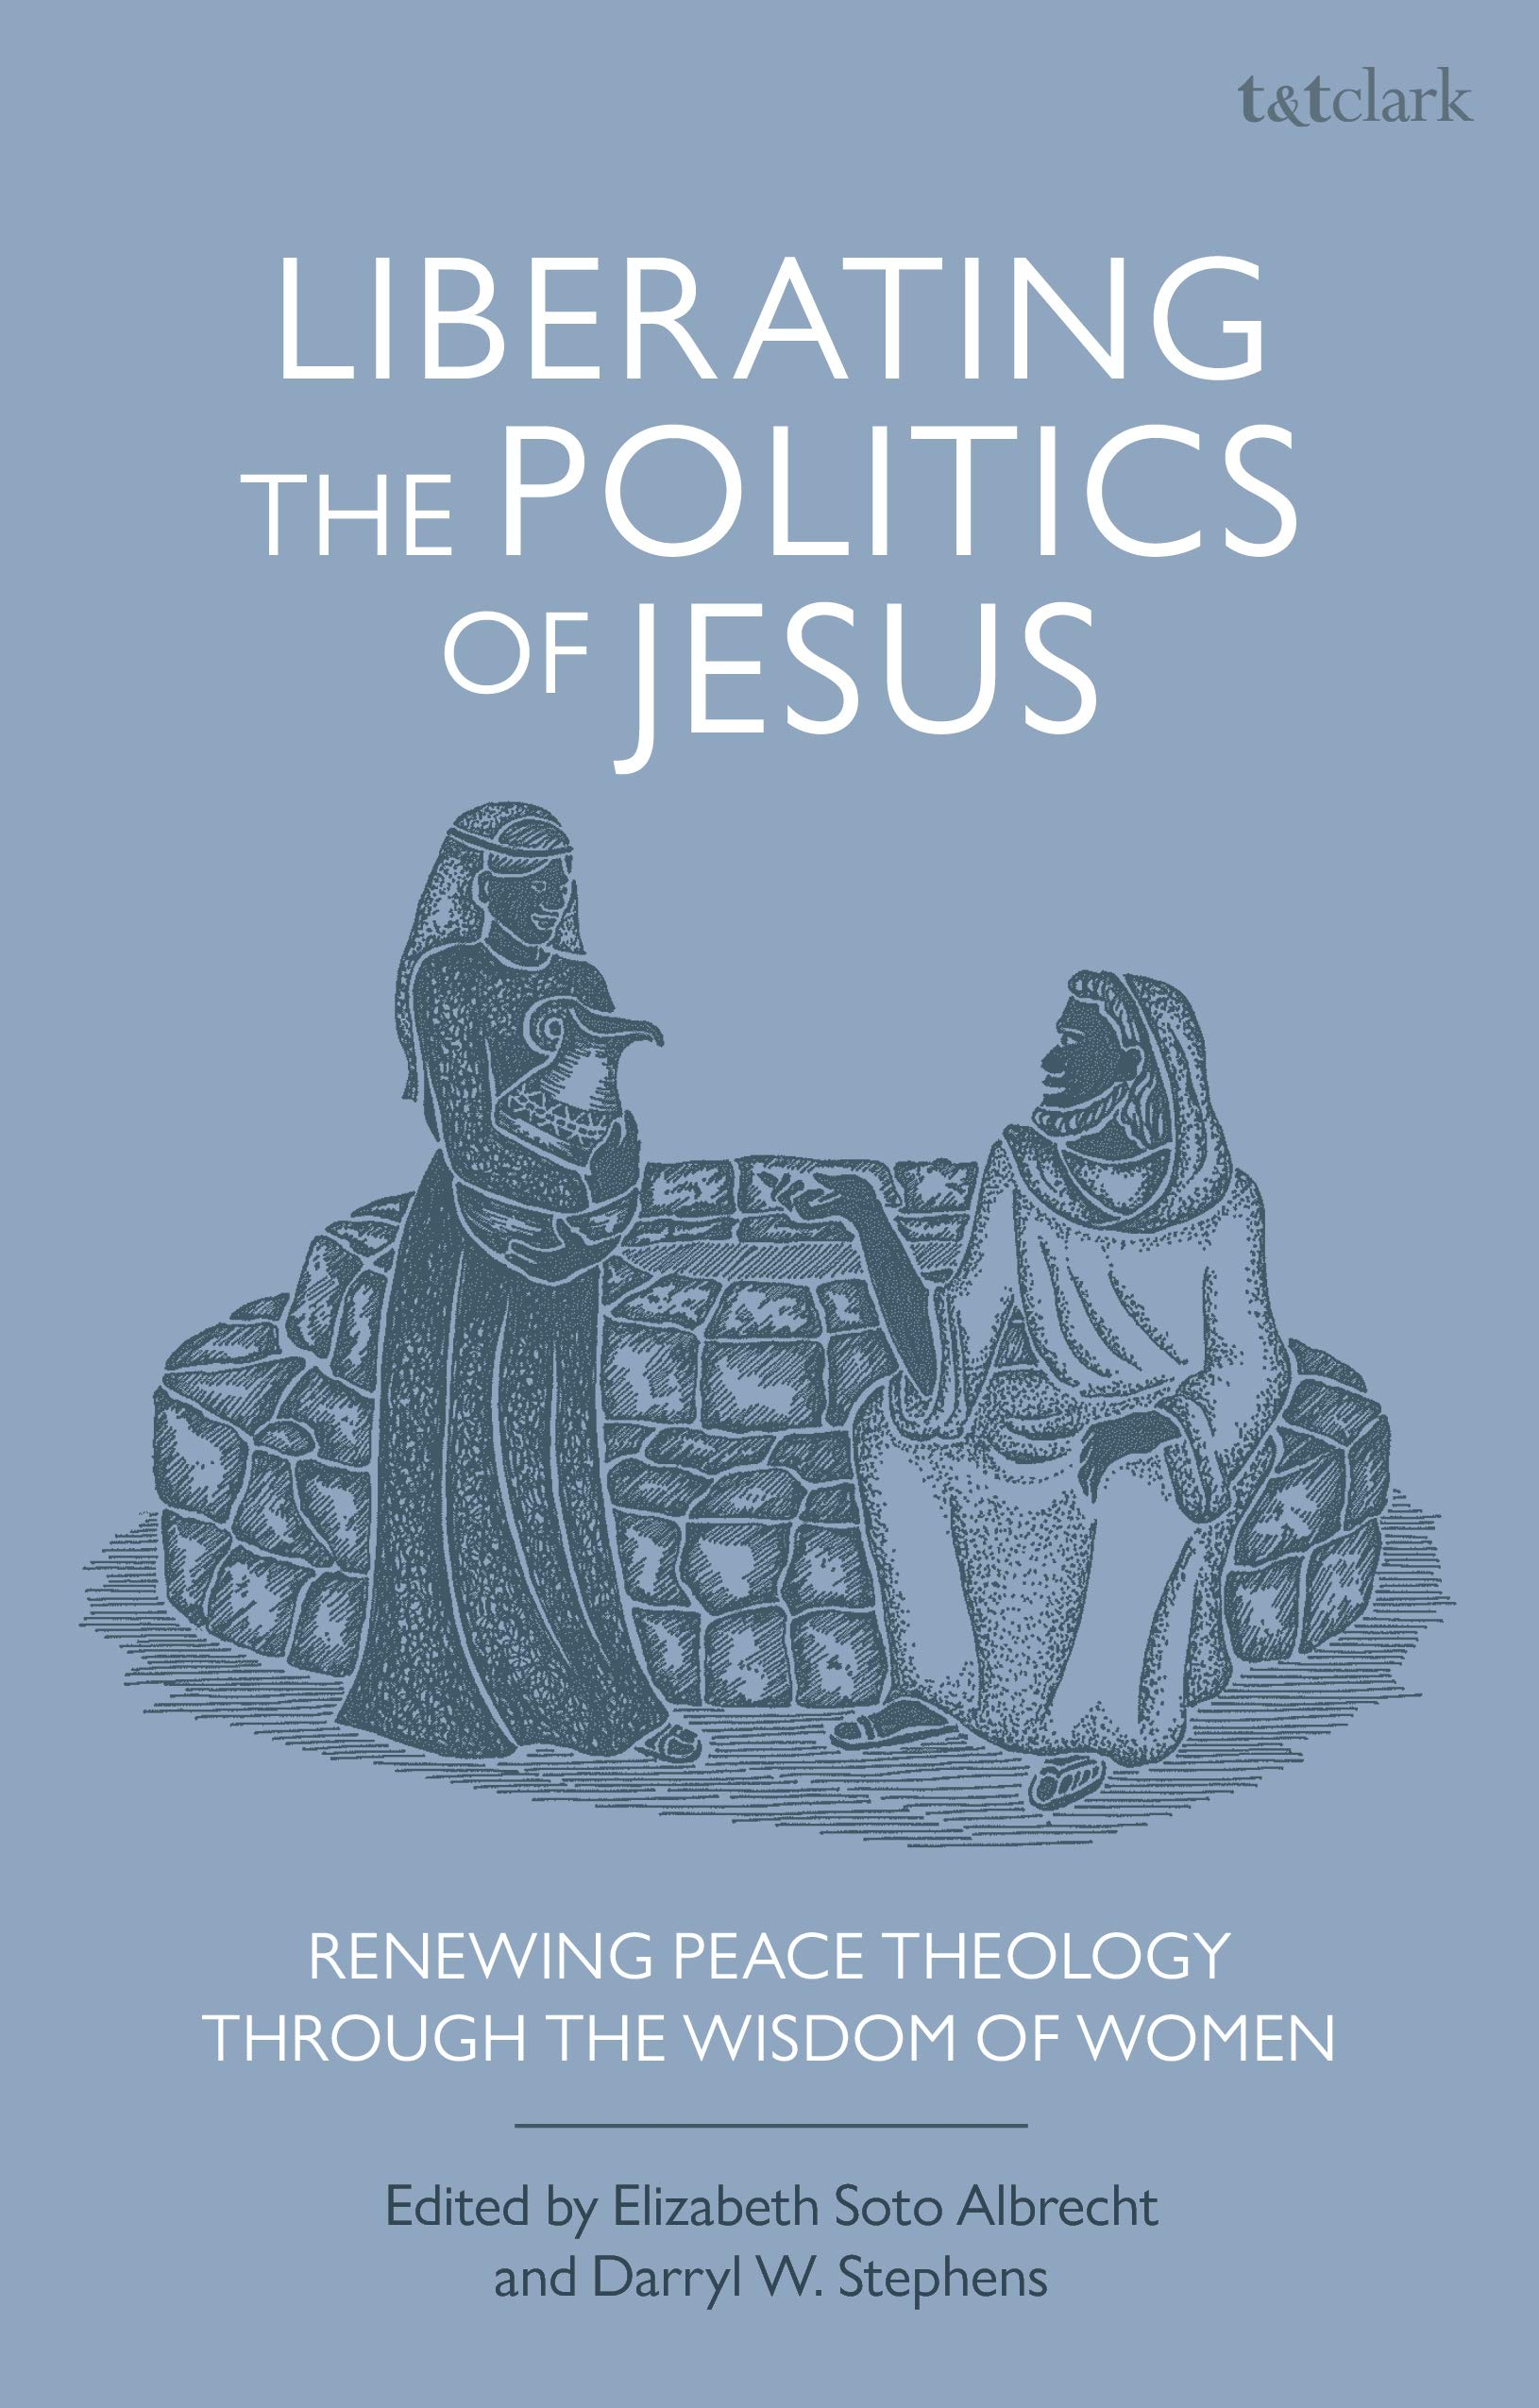 Liberating the Politics of Jesus: Renewing Peace Theology through the Wisdom of Women